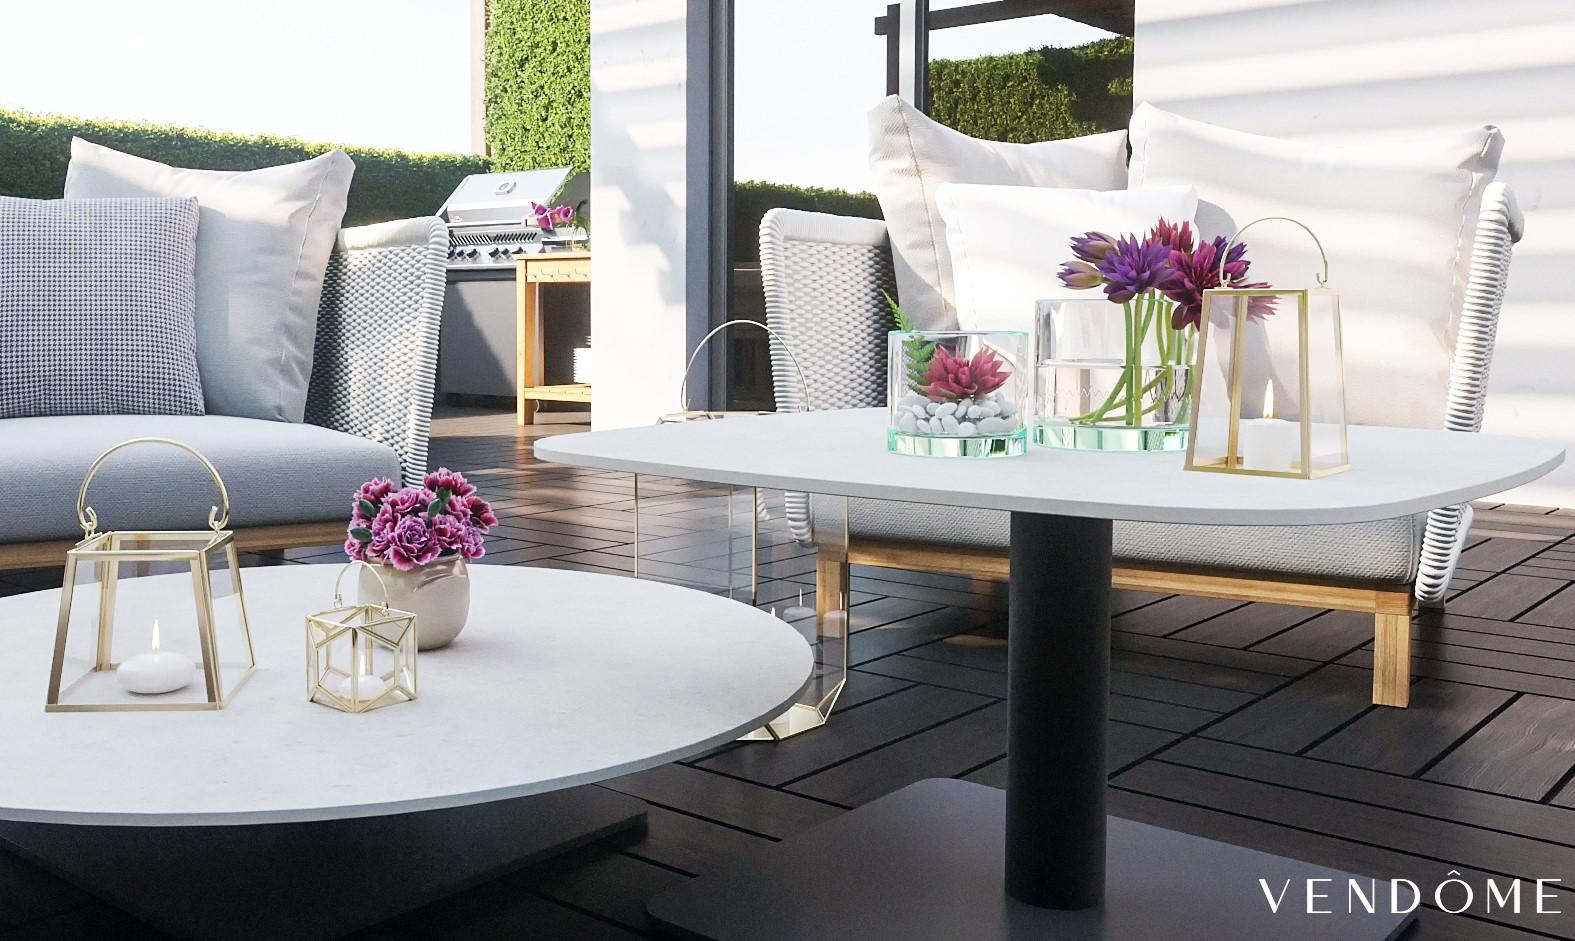 Vendome Ritz Parkside Collection Rooftop Patio 3 2